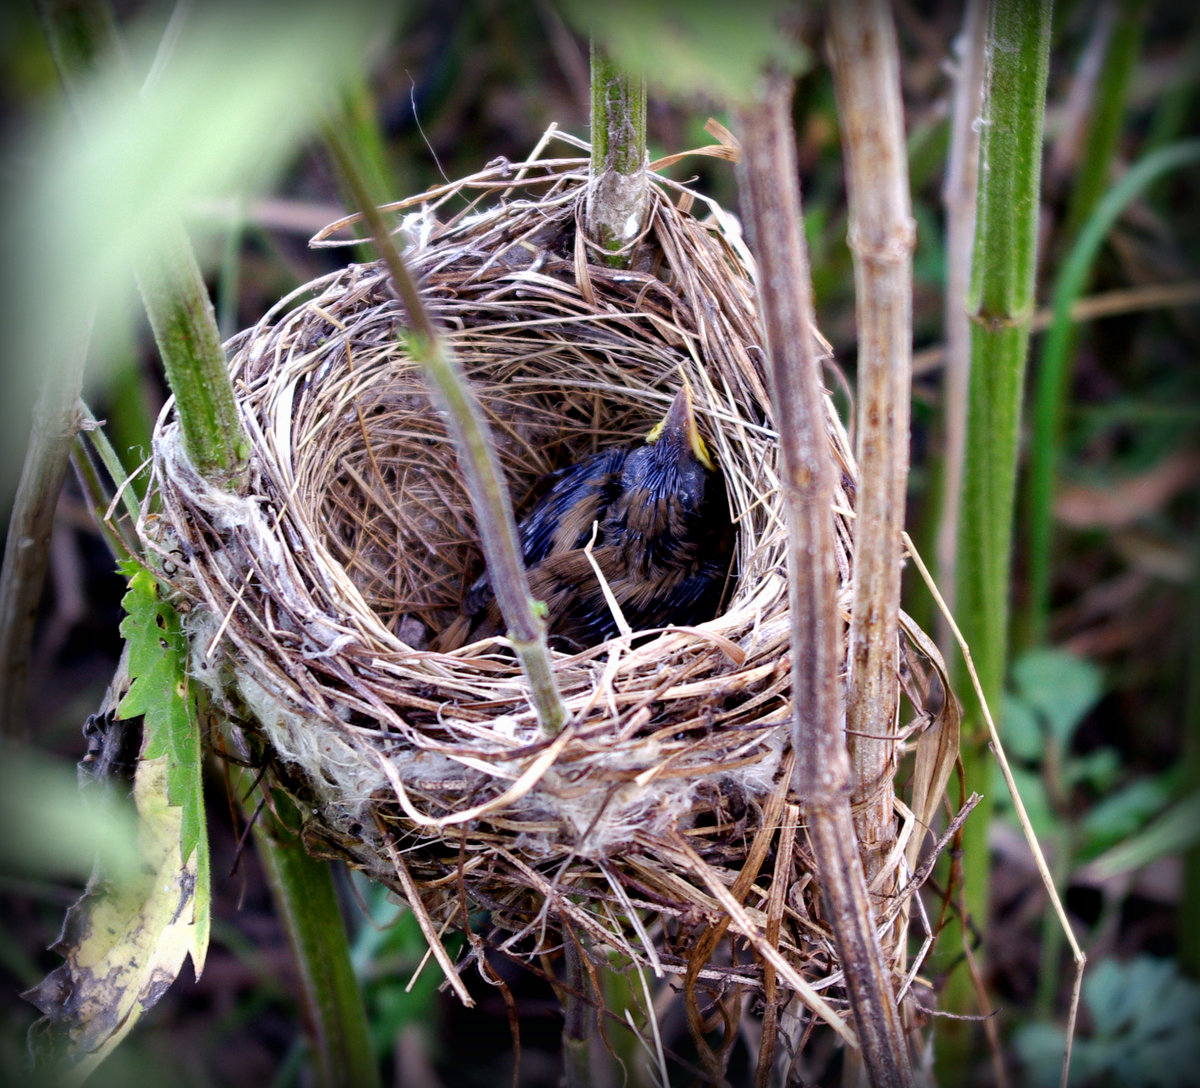 изделия гнездо птиц фото же, кто